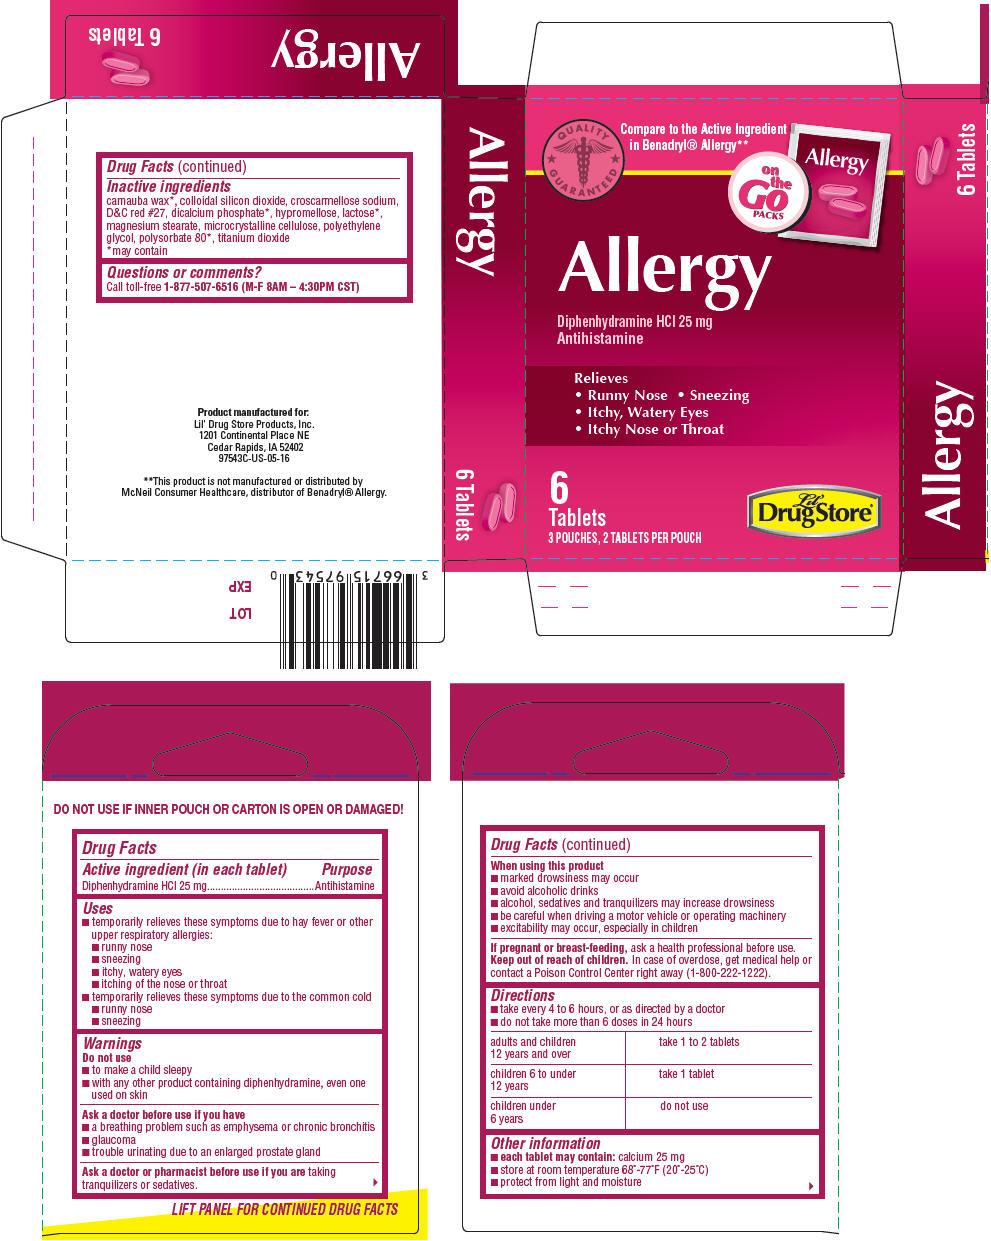 Diphenhydramine Hydrochloride - Antihistamine (Lil Drug Store Allergy)